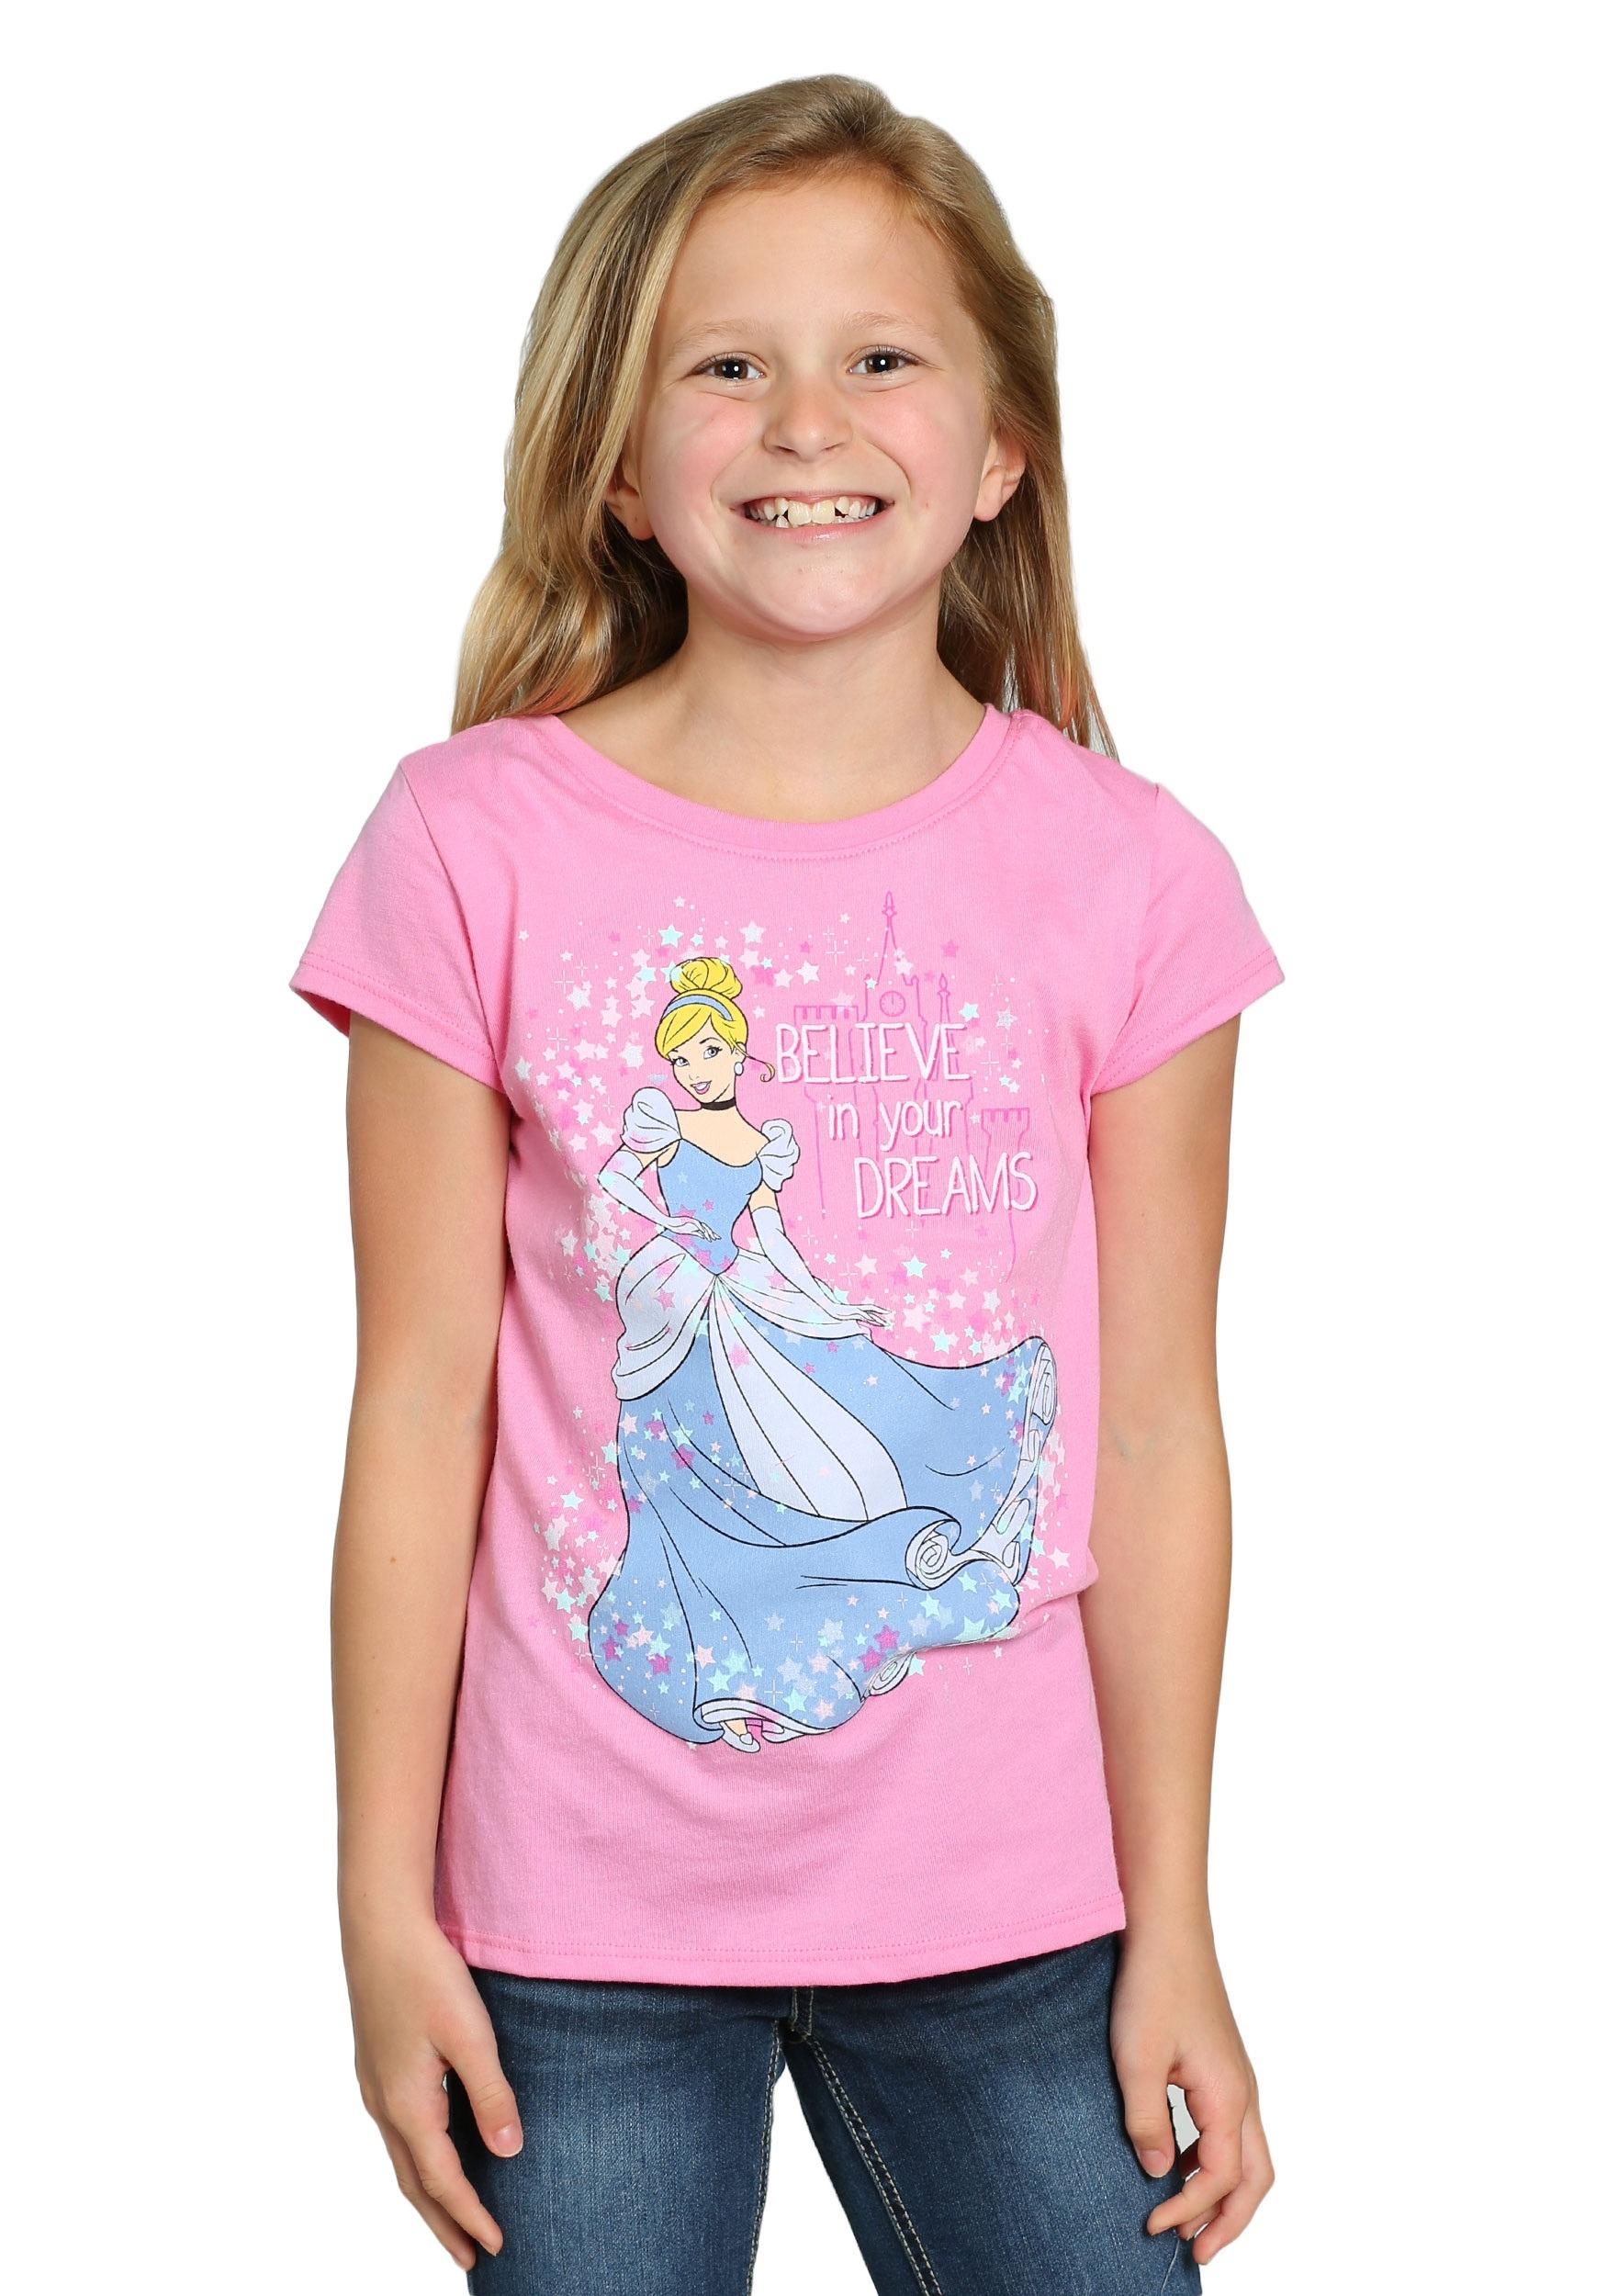 Cinderella Believe In Your Dreams Girls T Shirt